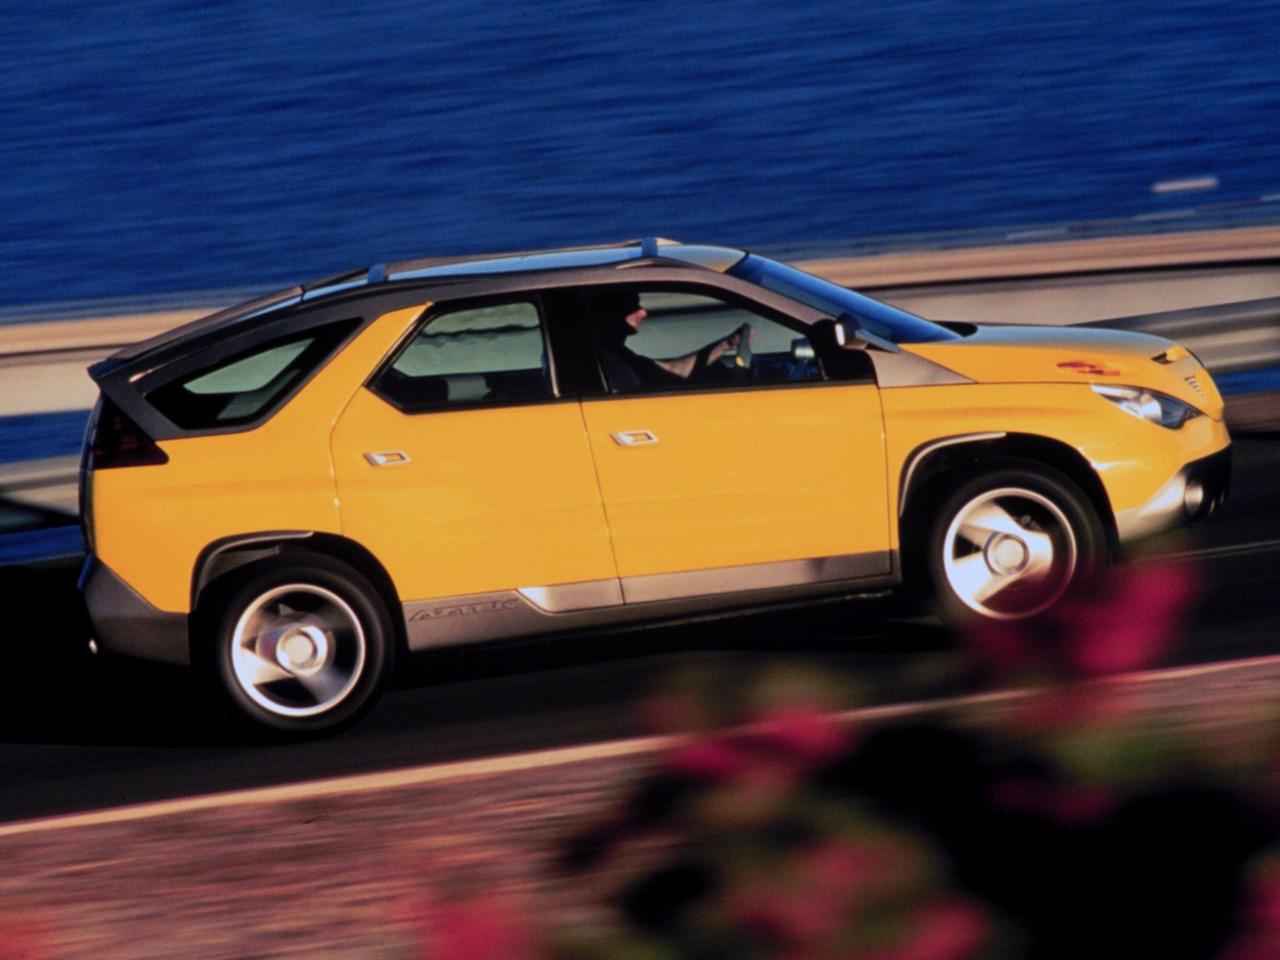 First Team Toyota >> Pontiac Aztek Concept (1999) - Old Concept Cars